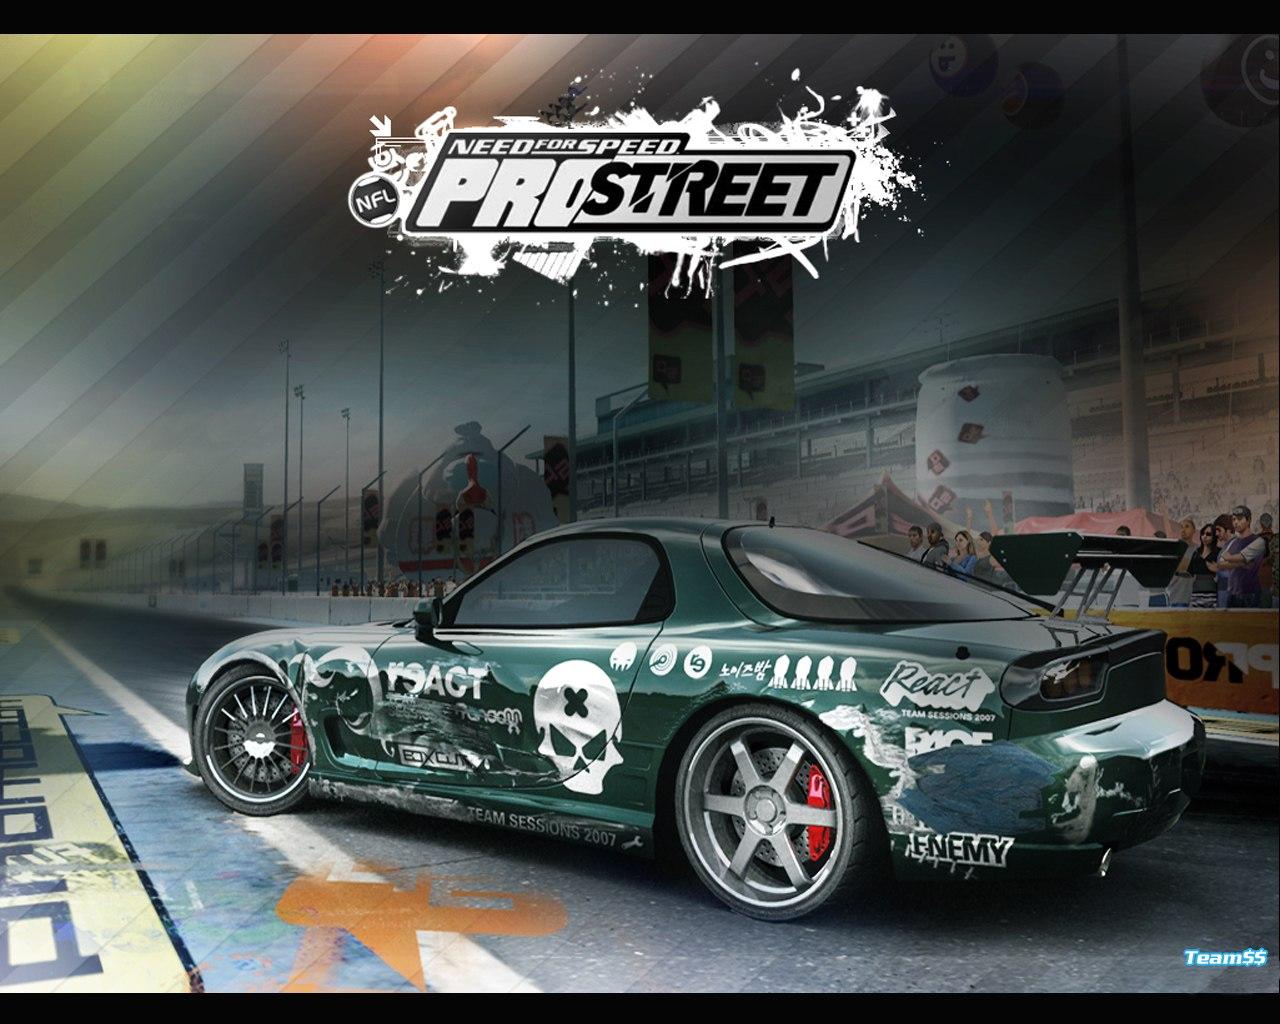 http://1.bp.blogspot.com/-FQz8km8i1IQ/TaiiH5S3wZI/AAAAAAAAGos/hrvnrTpwfxY/s1600/Need_For_Speed_Pro_Street.jpg